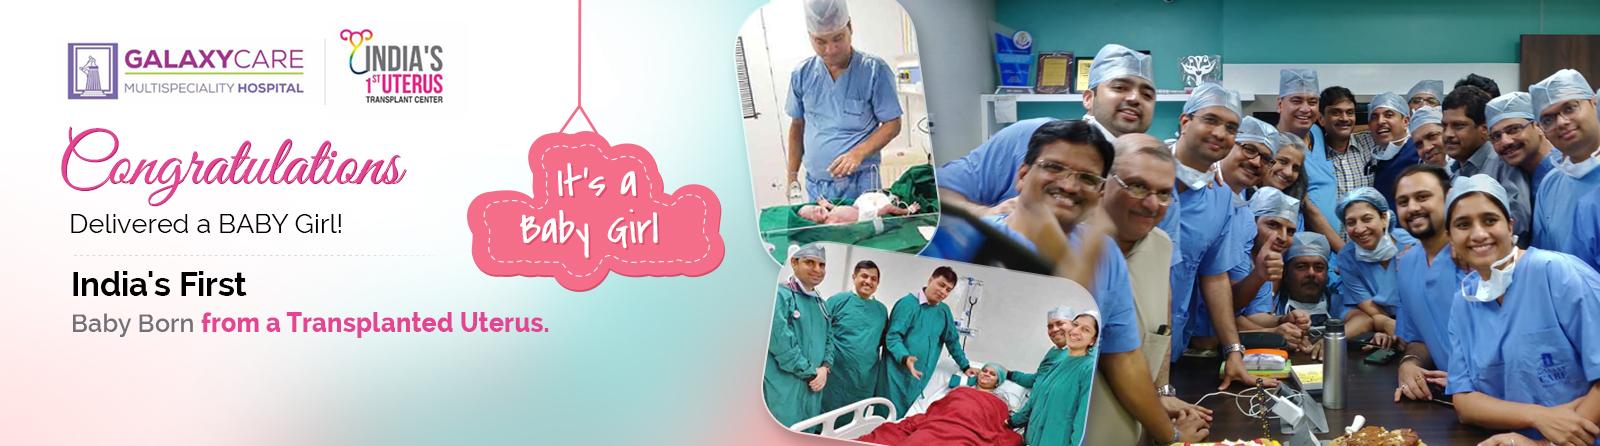 Gynaecologist + laparoscopic surgeon in pune